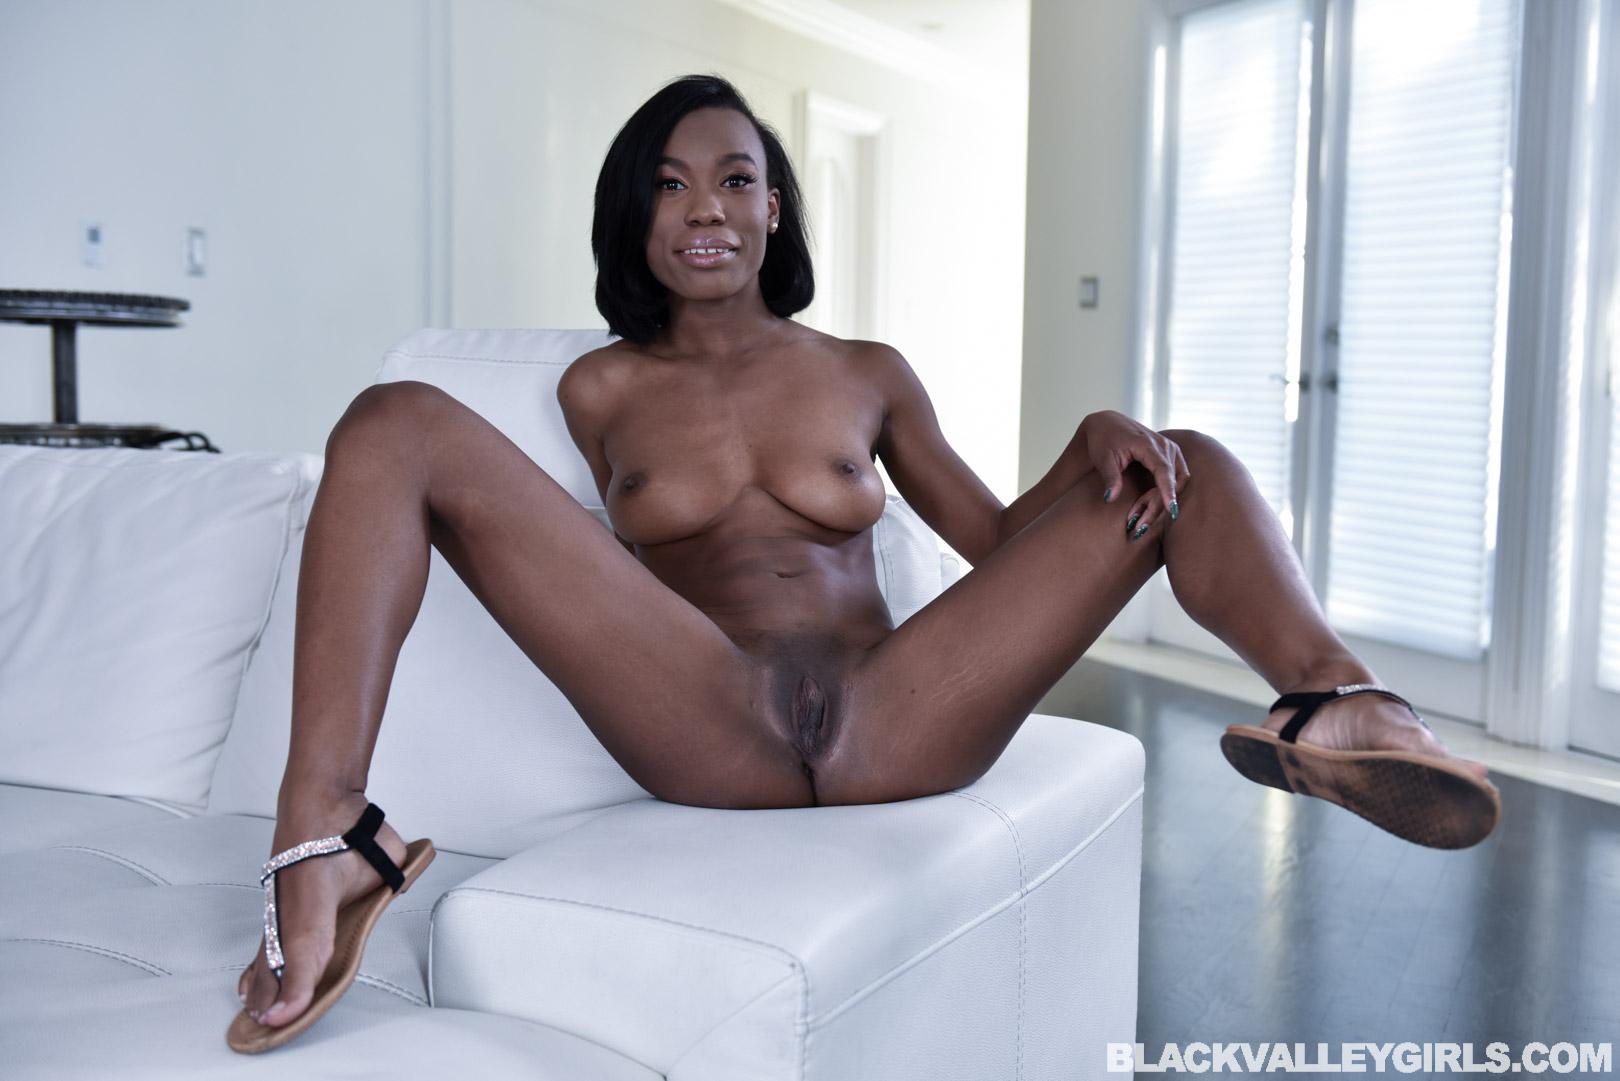 Nude black women images